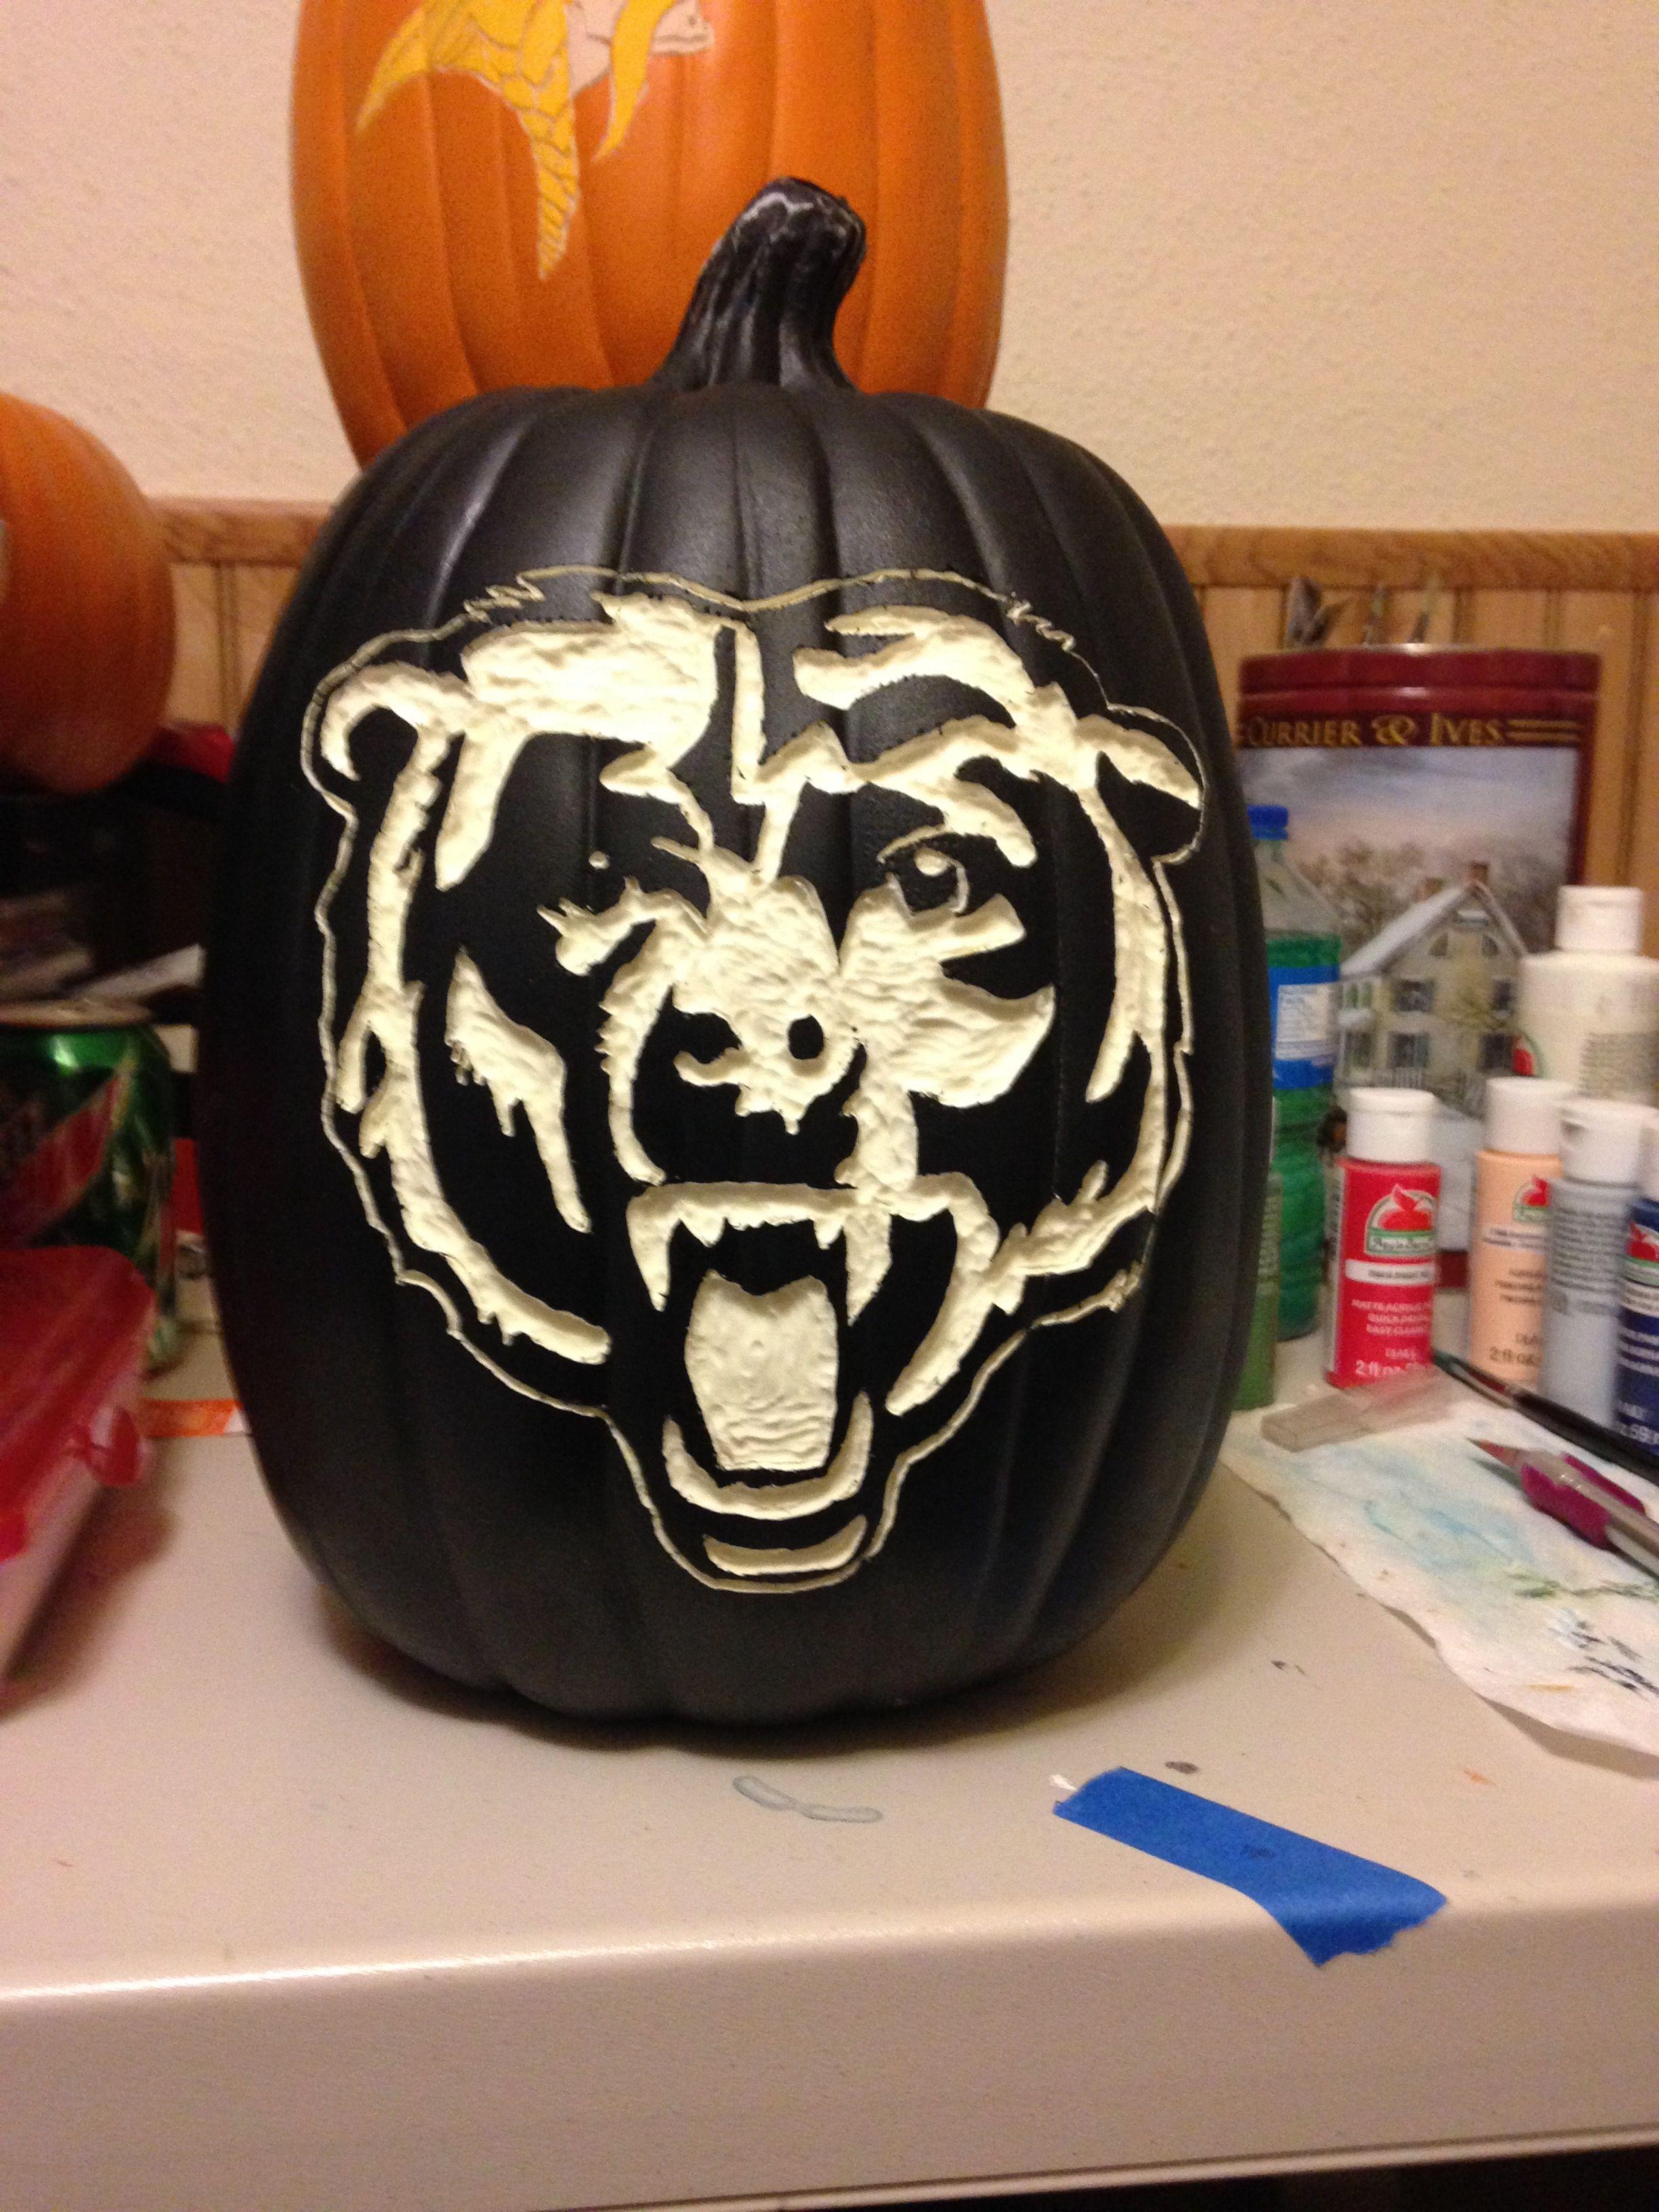 Chicago Bears Pumpkin carving, Fake pumpkins, Carving